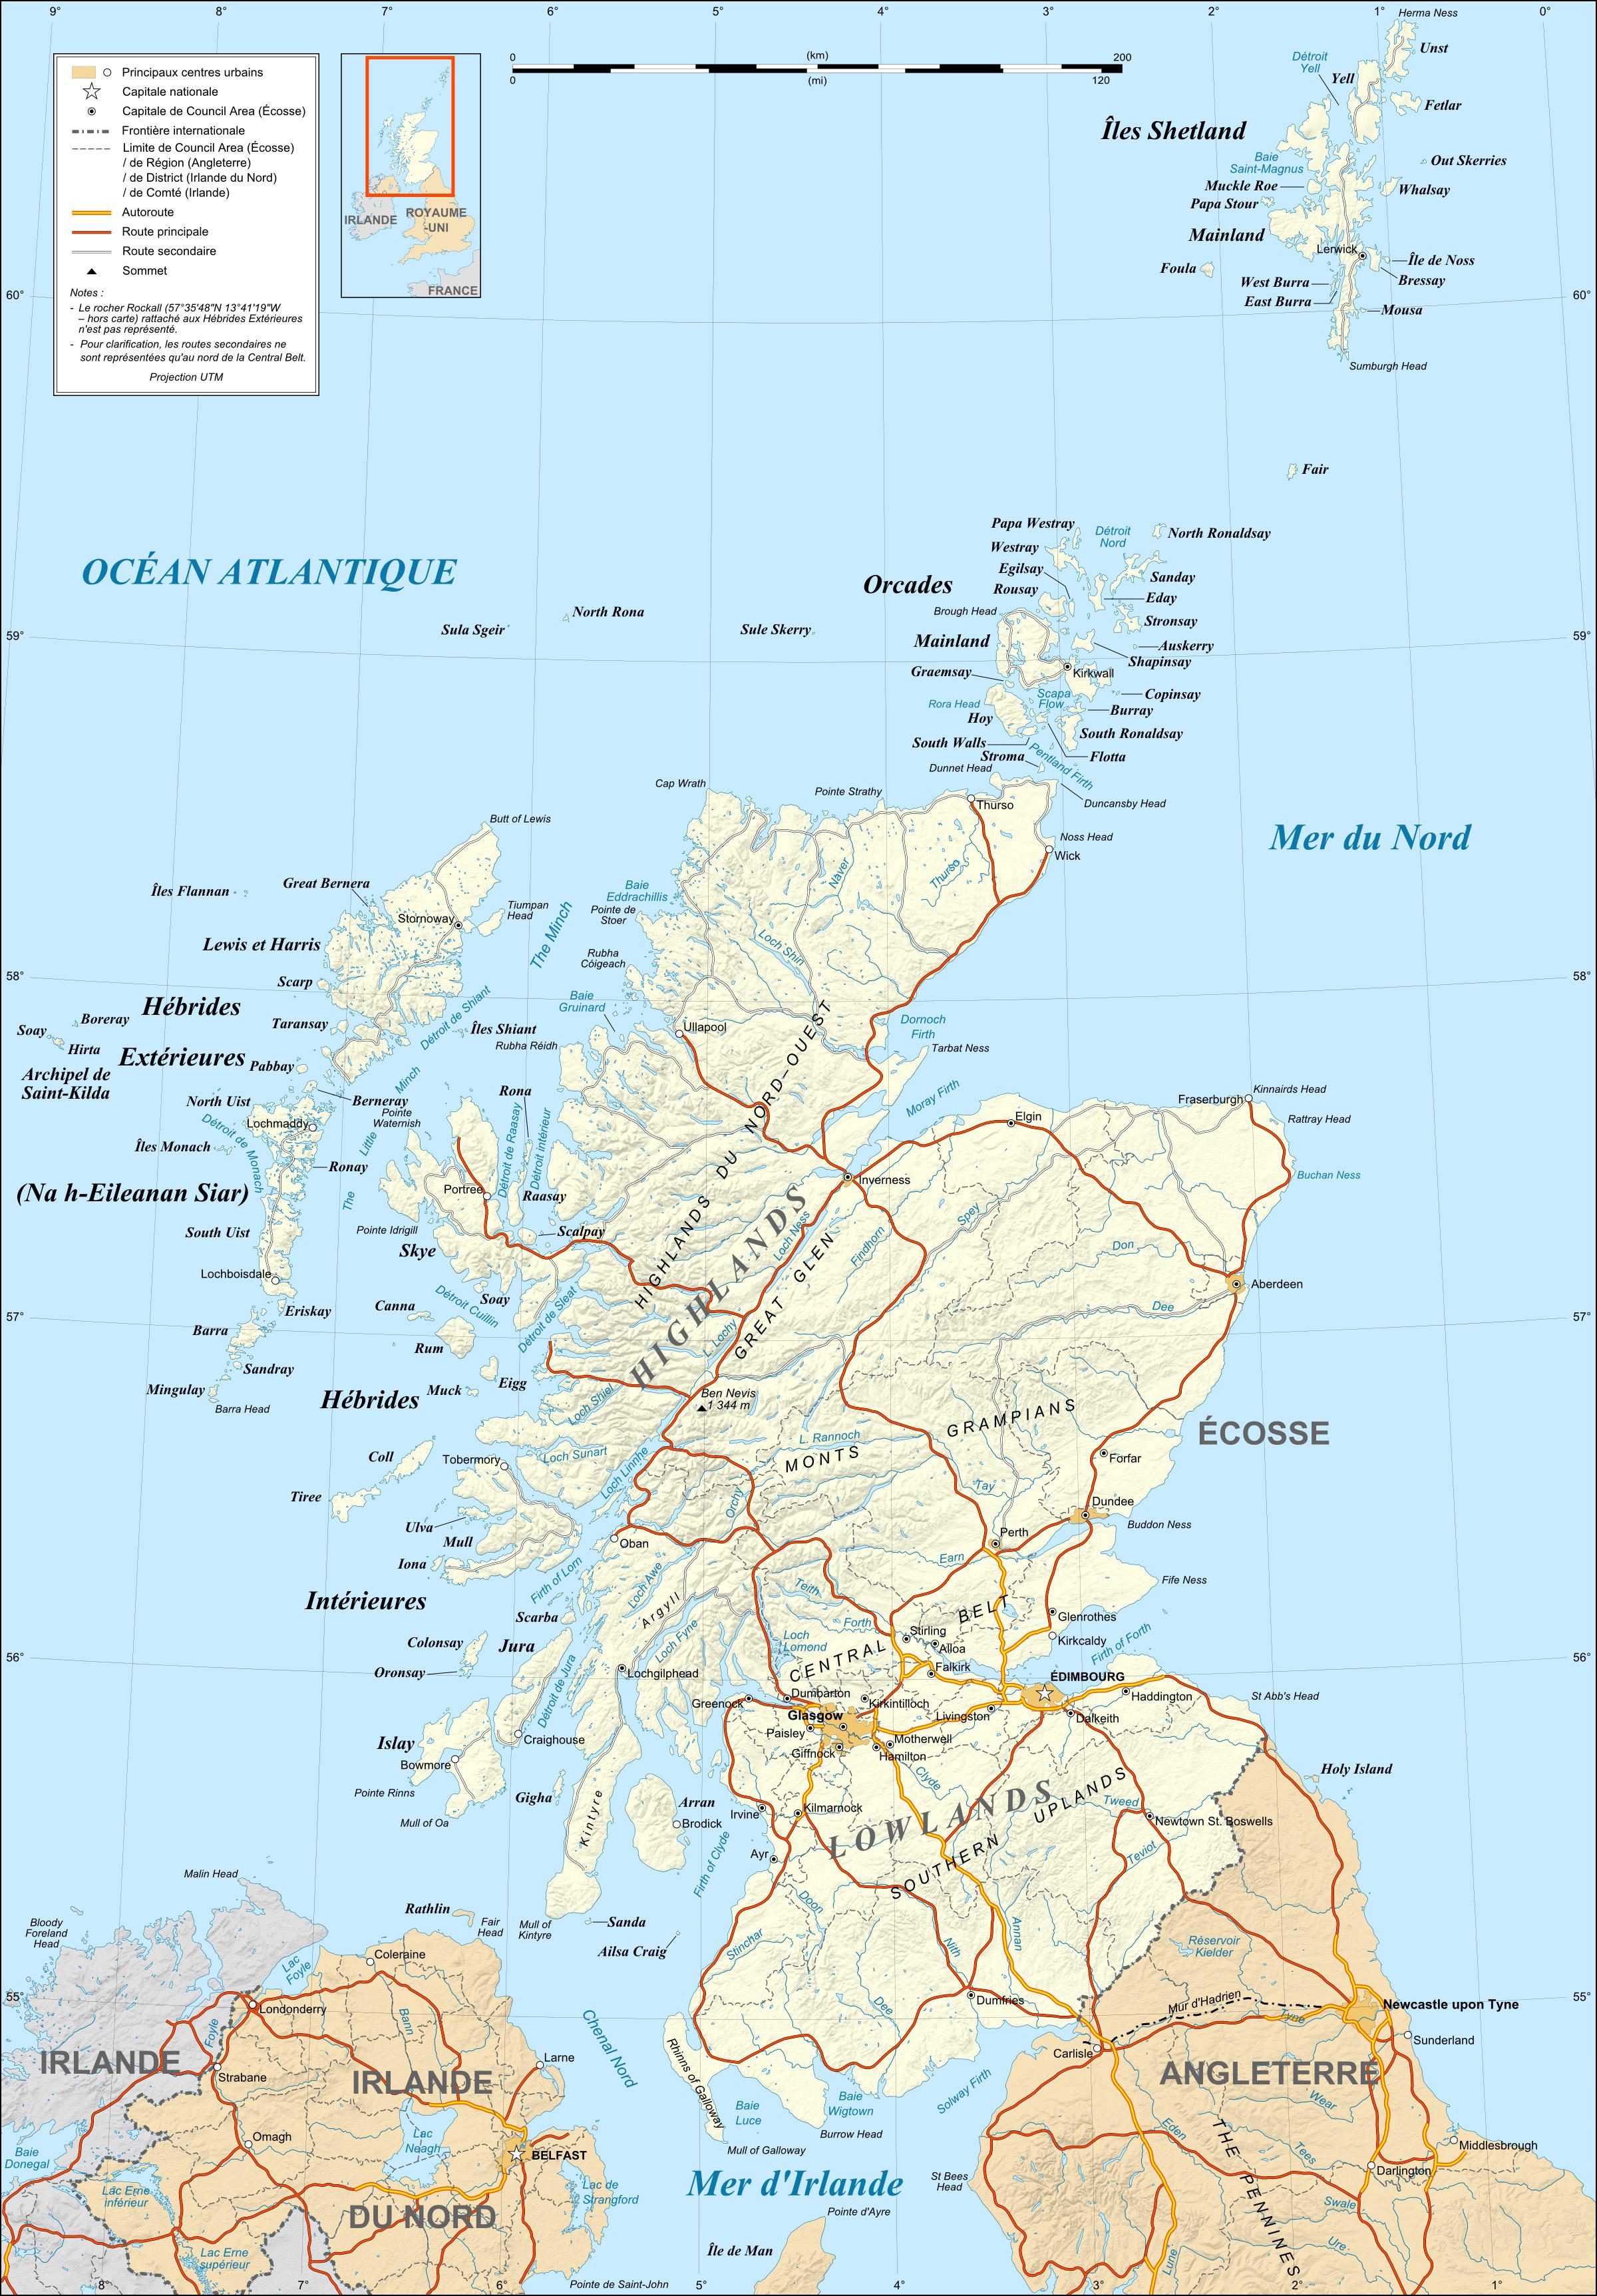 Escocia Mapa Reino Unido.Geografia De Escocia Wikipedia La Enciclopedia Libre